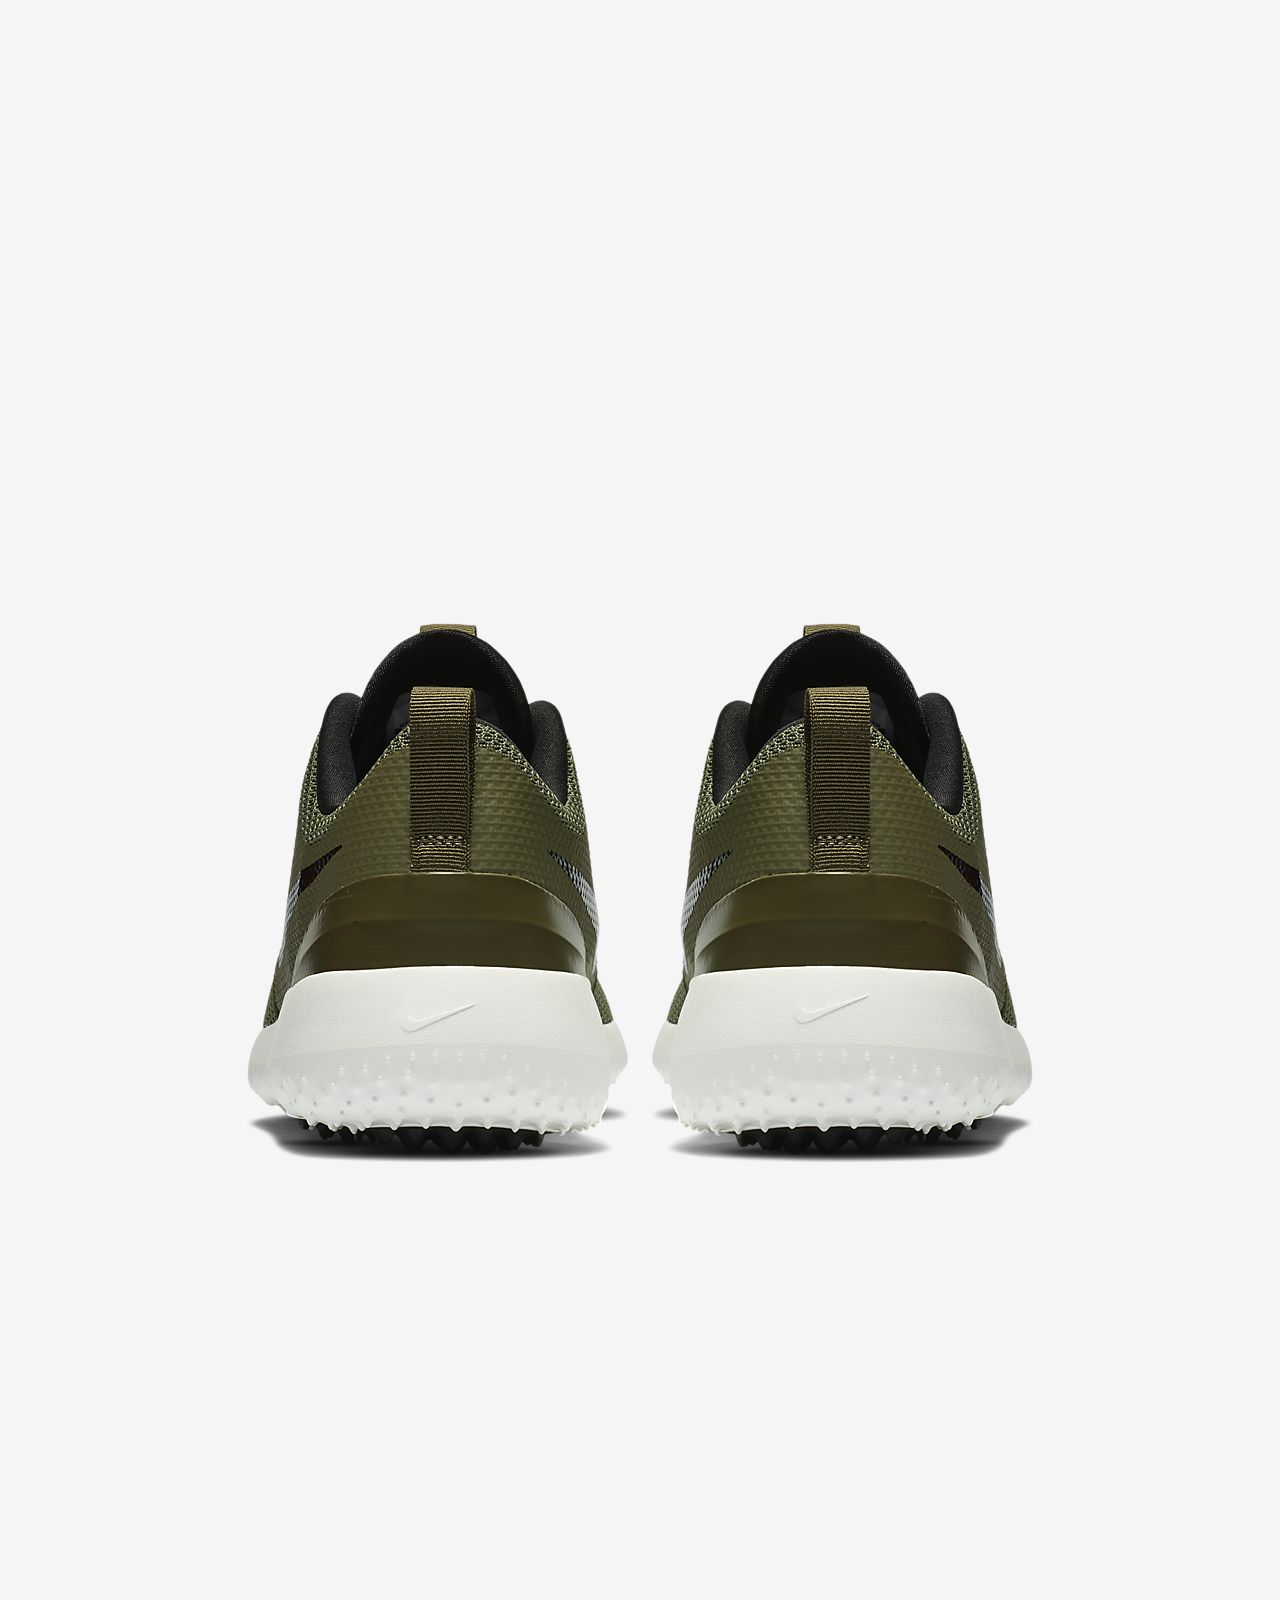 best website b1976 5ad2b ... Chaussure de golf Nike Roshe G pour Homme